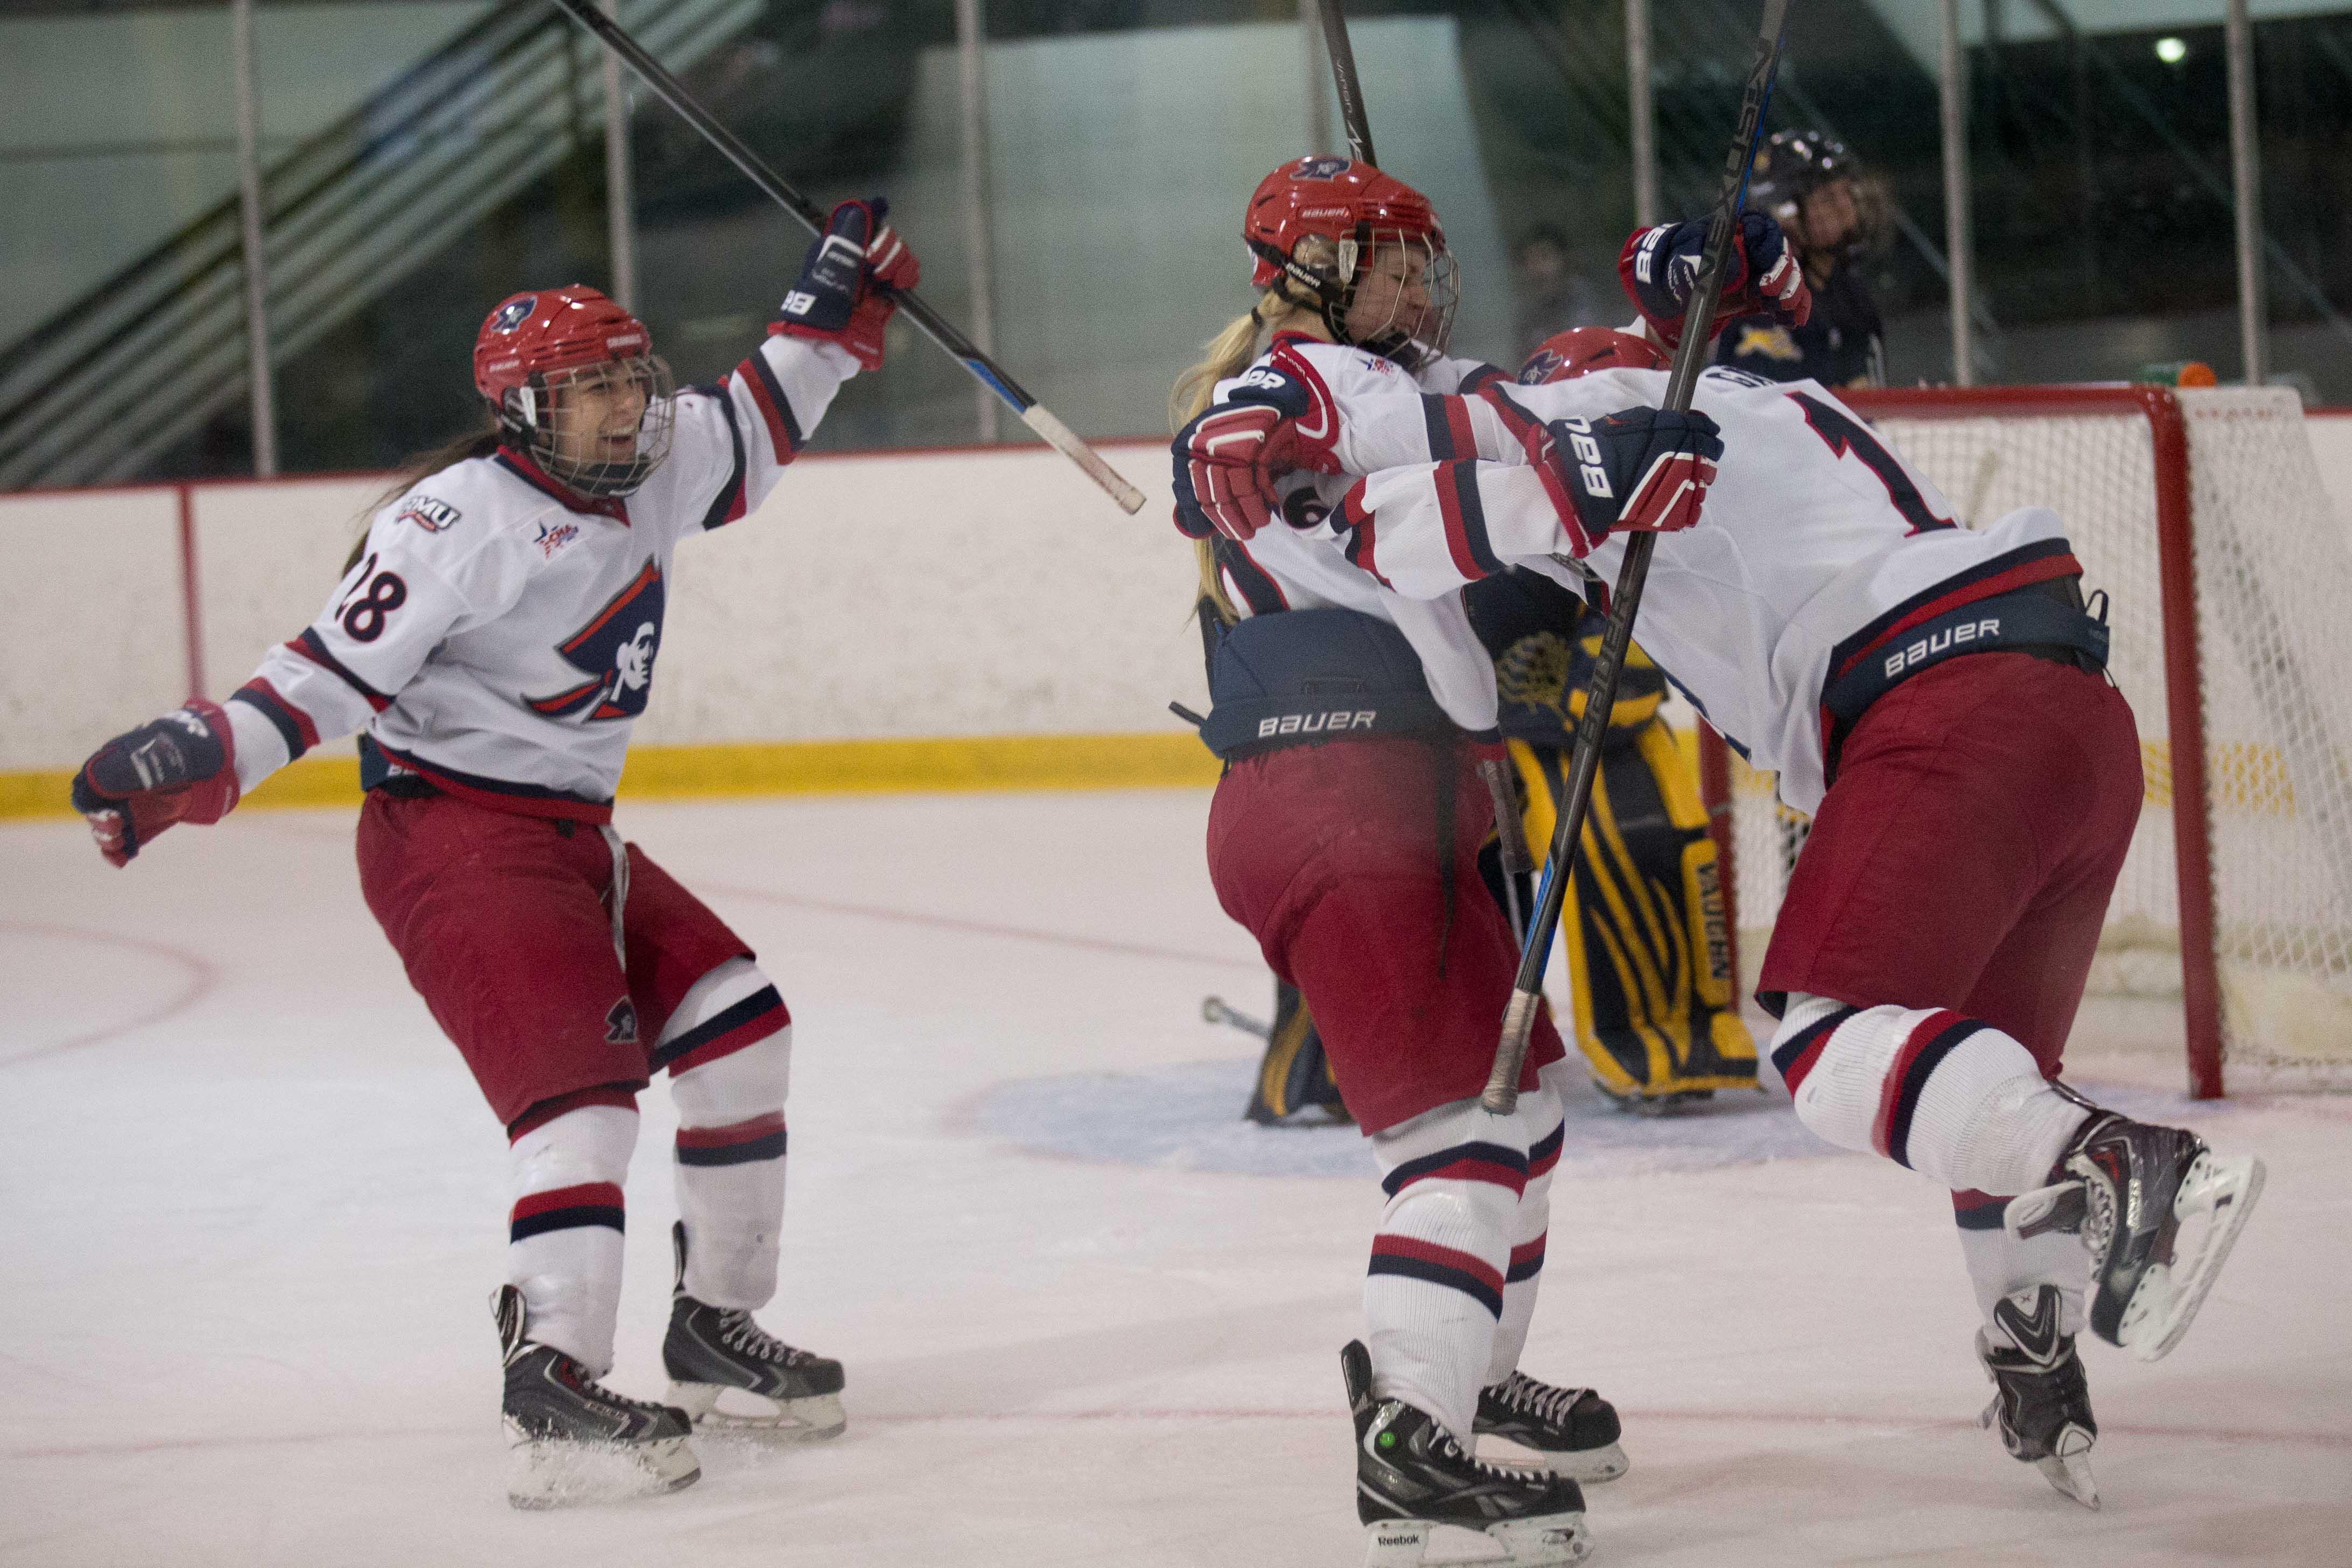 The RMU women's hockey team gets set to host its annual